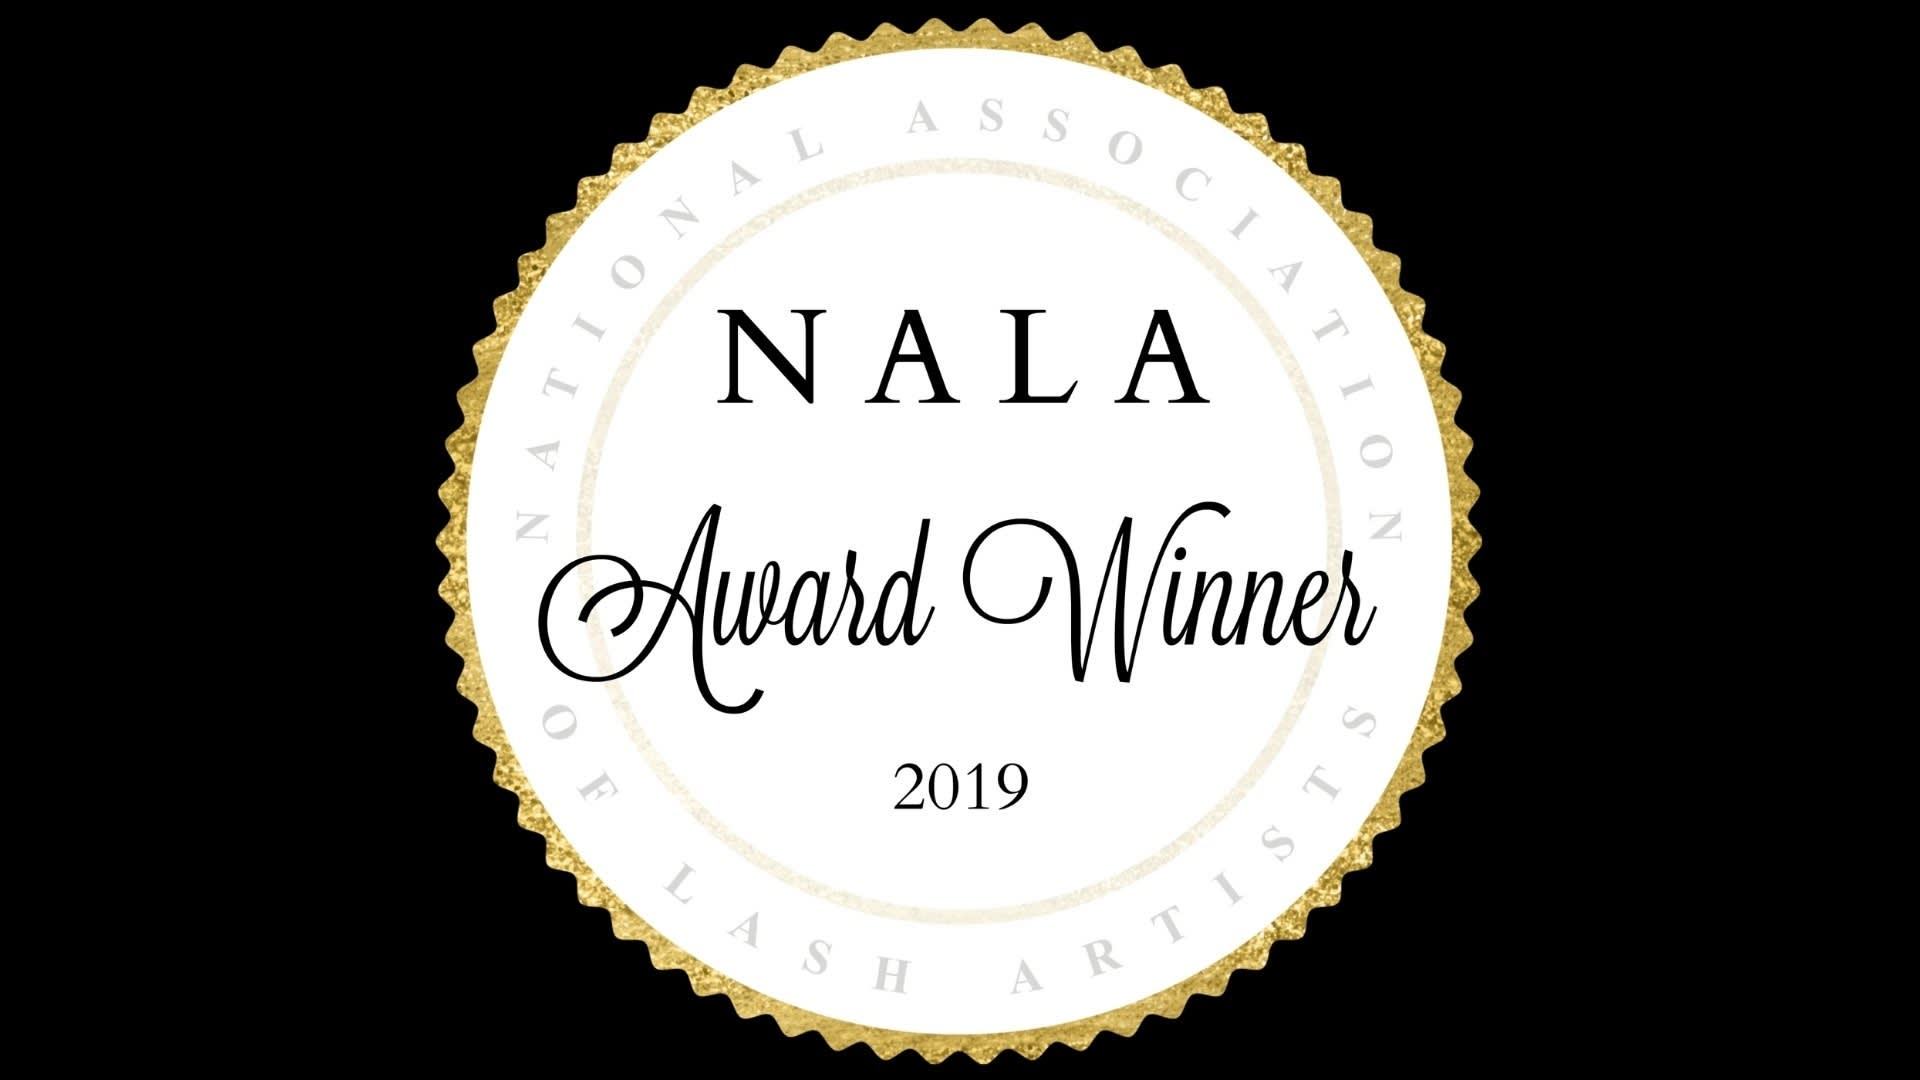 NALA Award Winners 2019 Logo